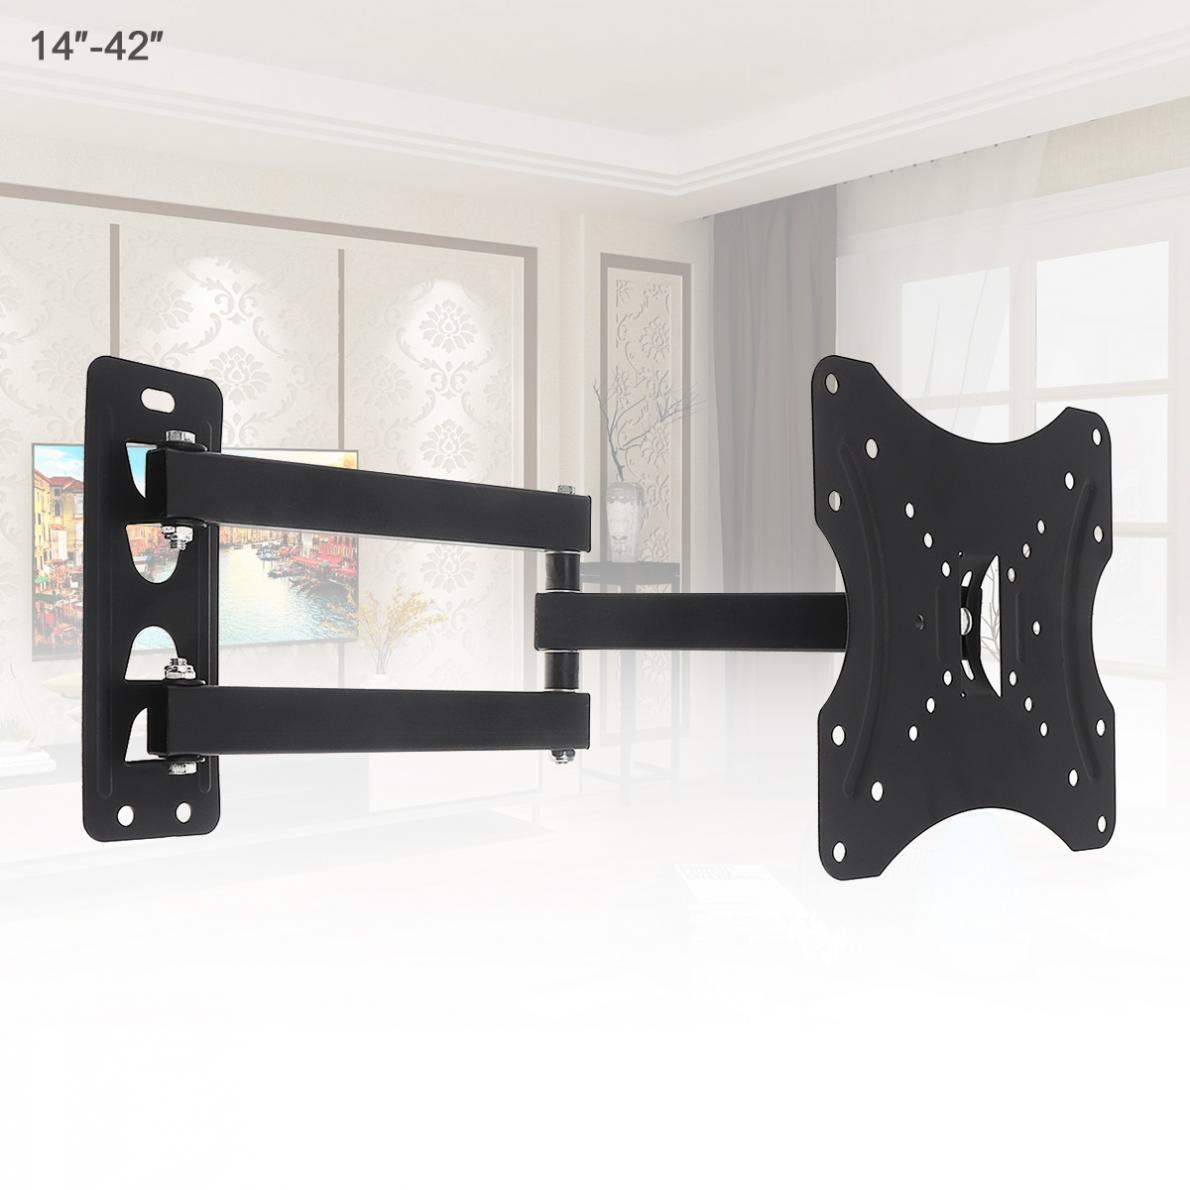 35KG Adjustable TV Wall Mount Bracket Flat Panel TV Frame Support 15 Degrees Tilt with Level 14-42 Inch LCD LED MonitorFlat Pan